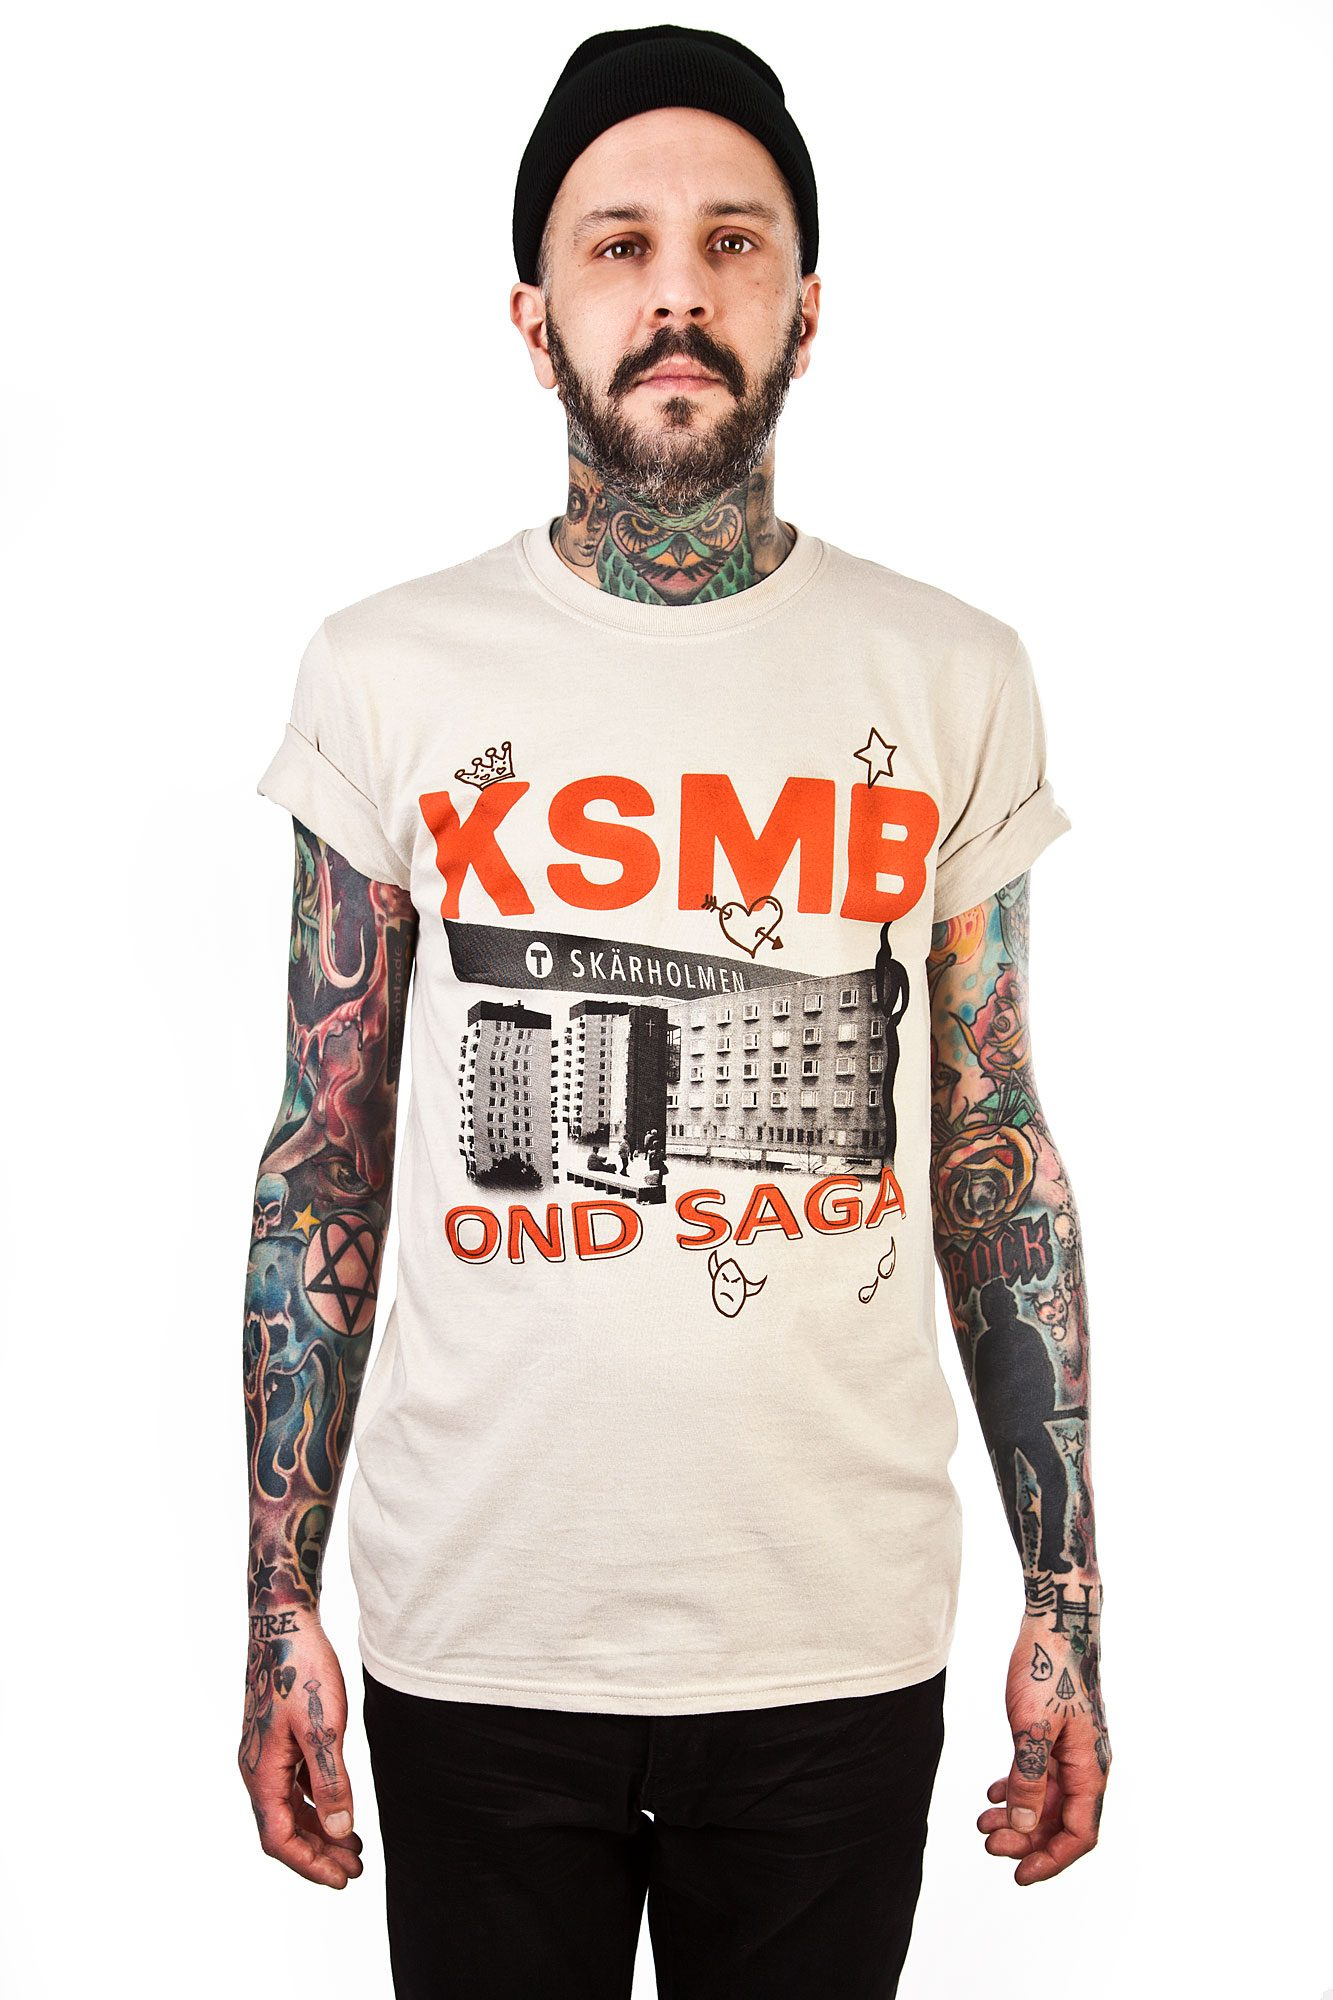 KSMB Ond Saga